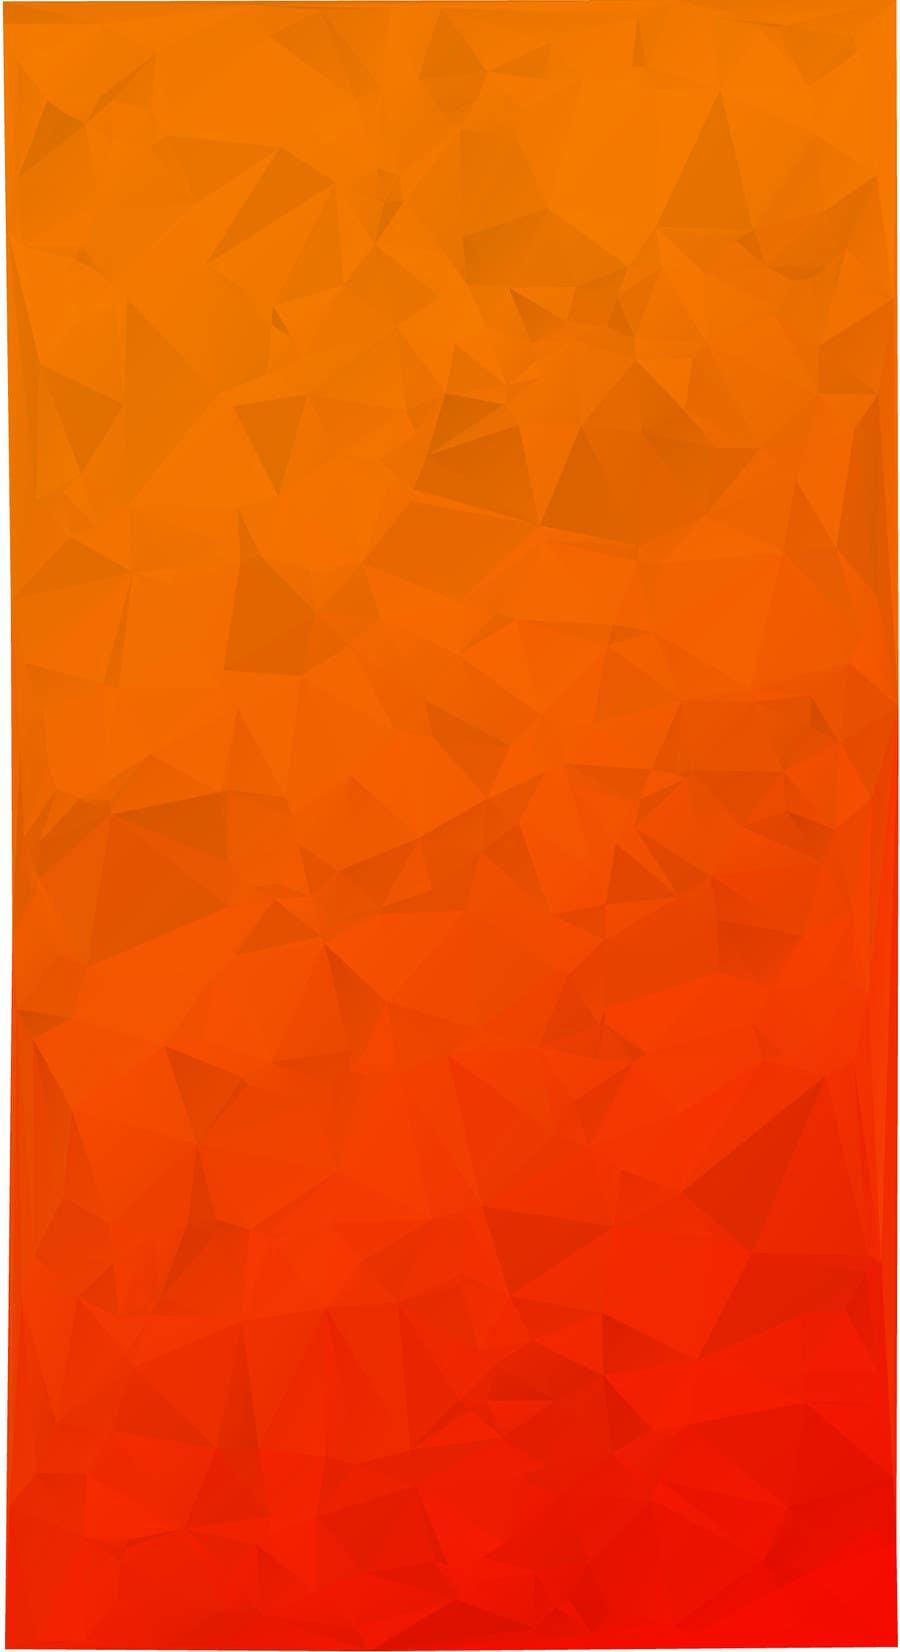 Konkurrenceindlæg #                                        13                                      for                                         Background image: graphic/geometric design needed